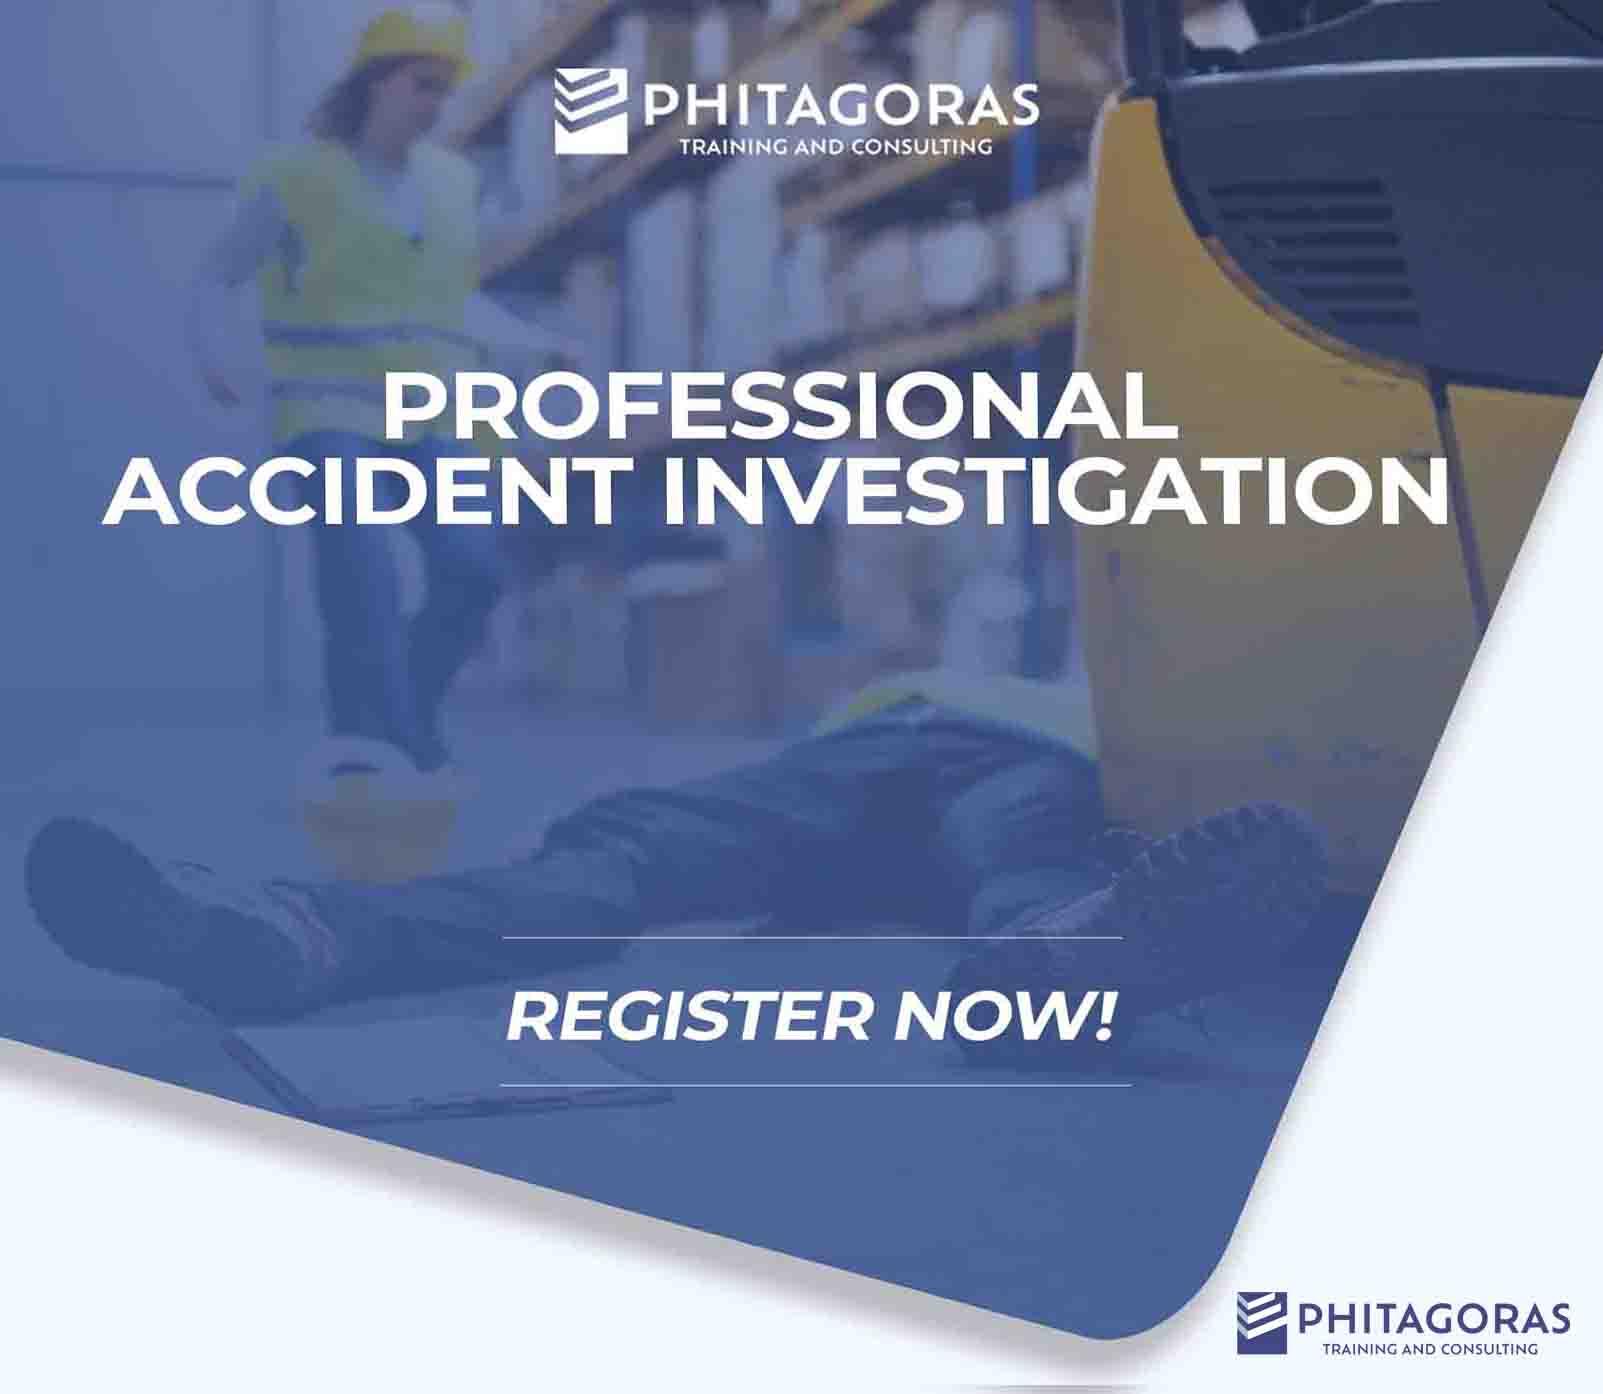 Professional Accident Investigation